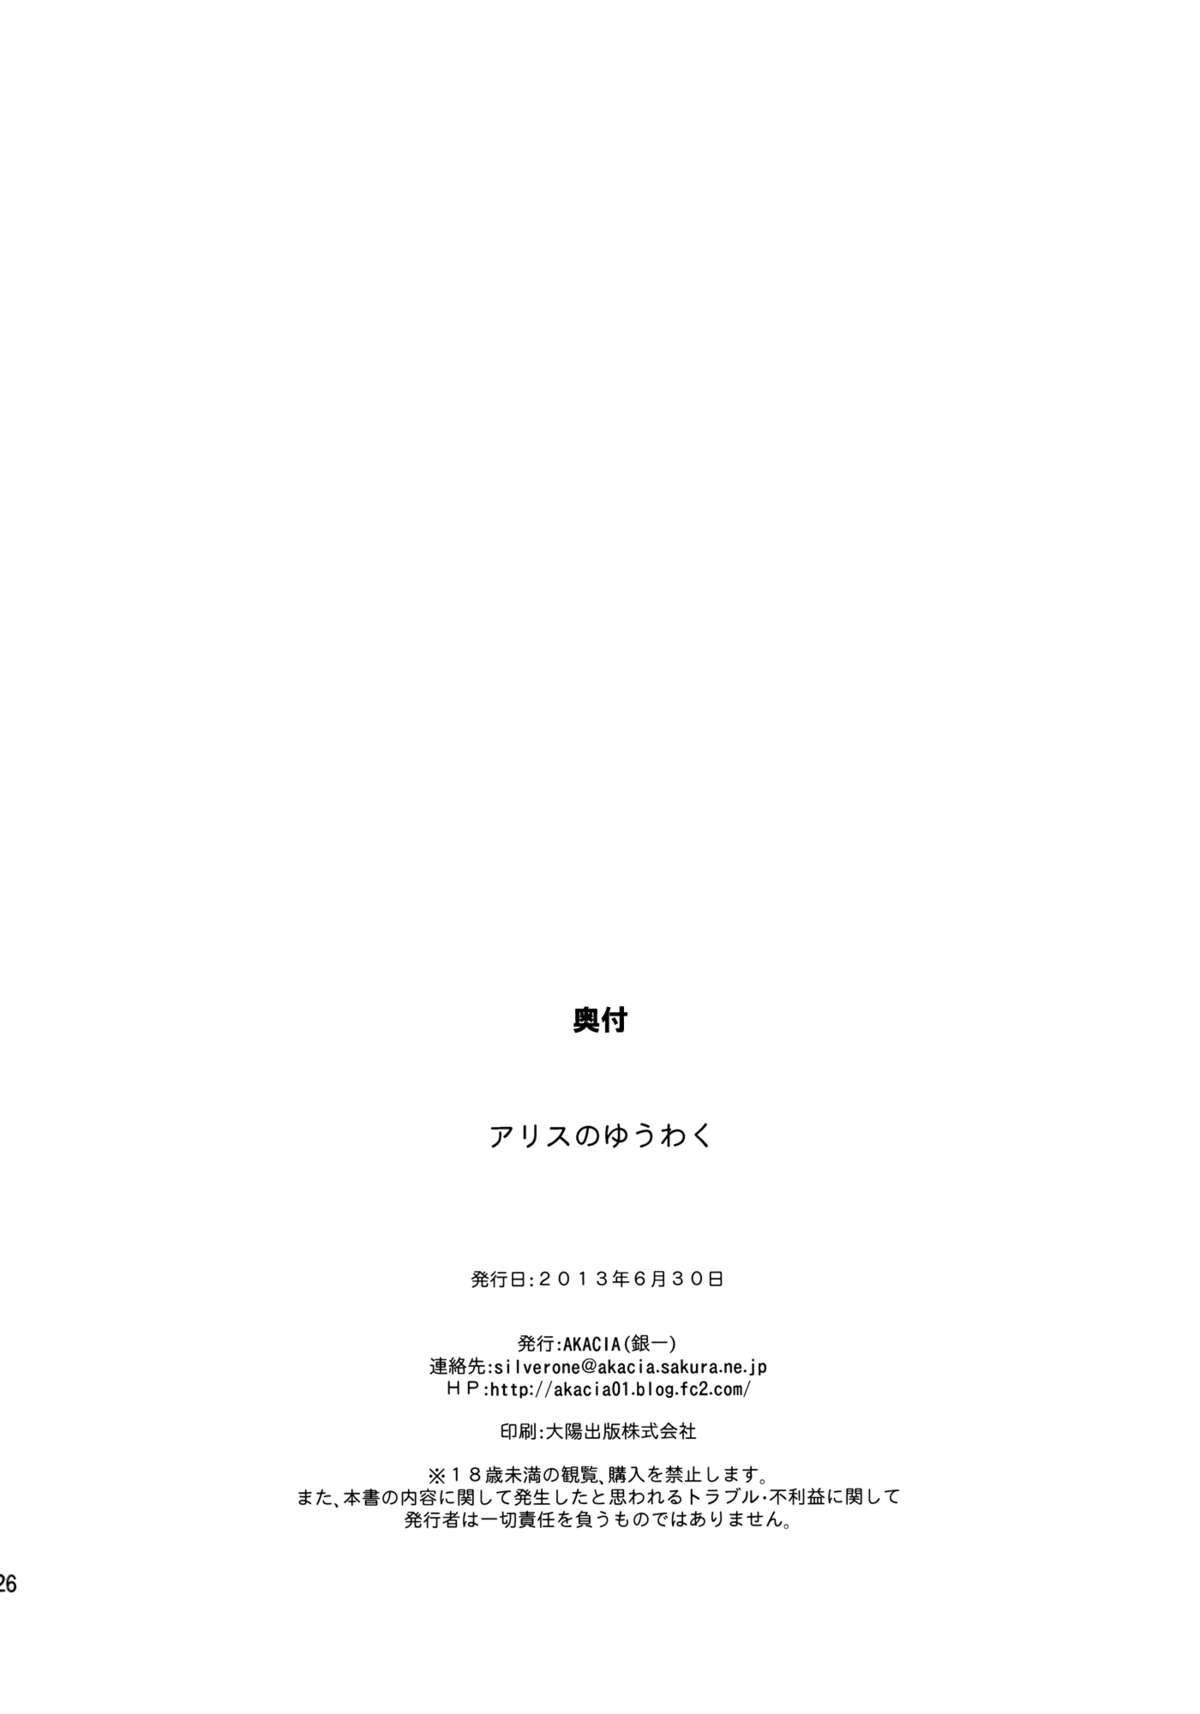 Alice no Yuuwaku | Alice's Temptation 24